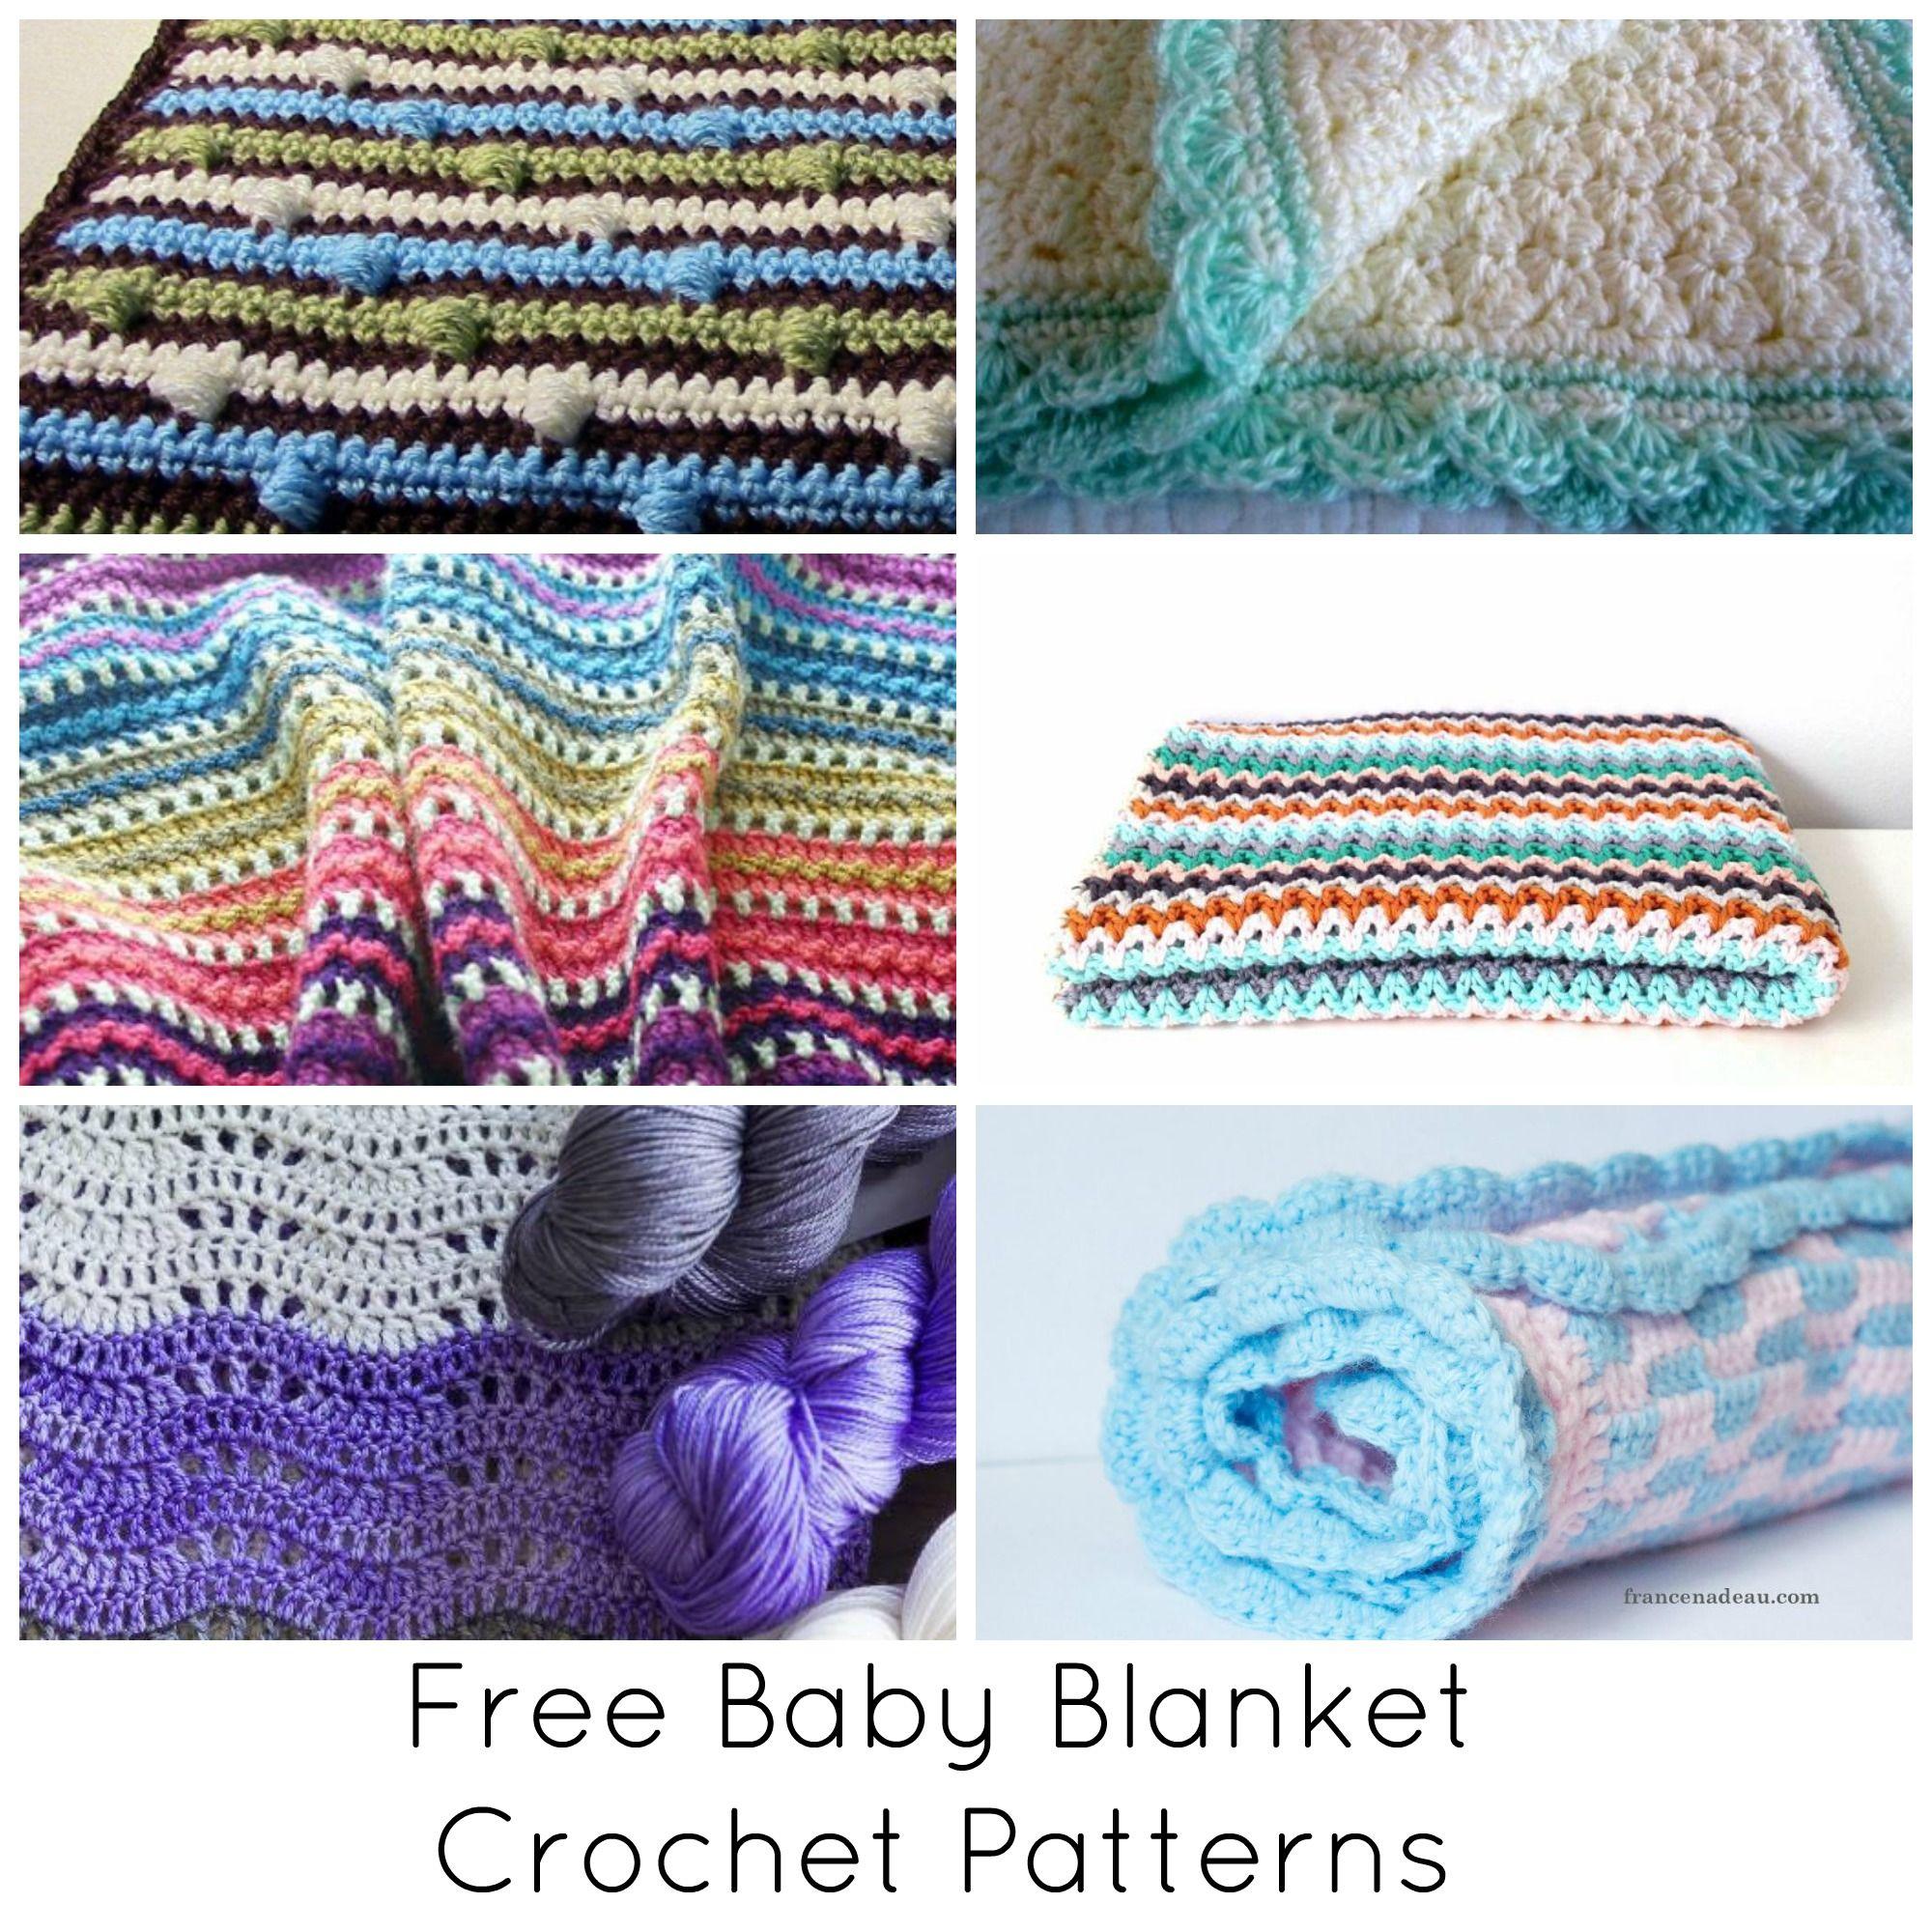 13 Free Crochet Baby Blanket Patterns